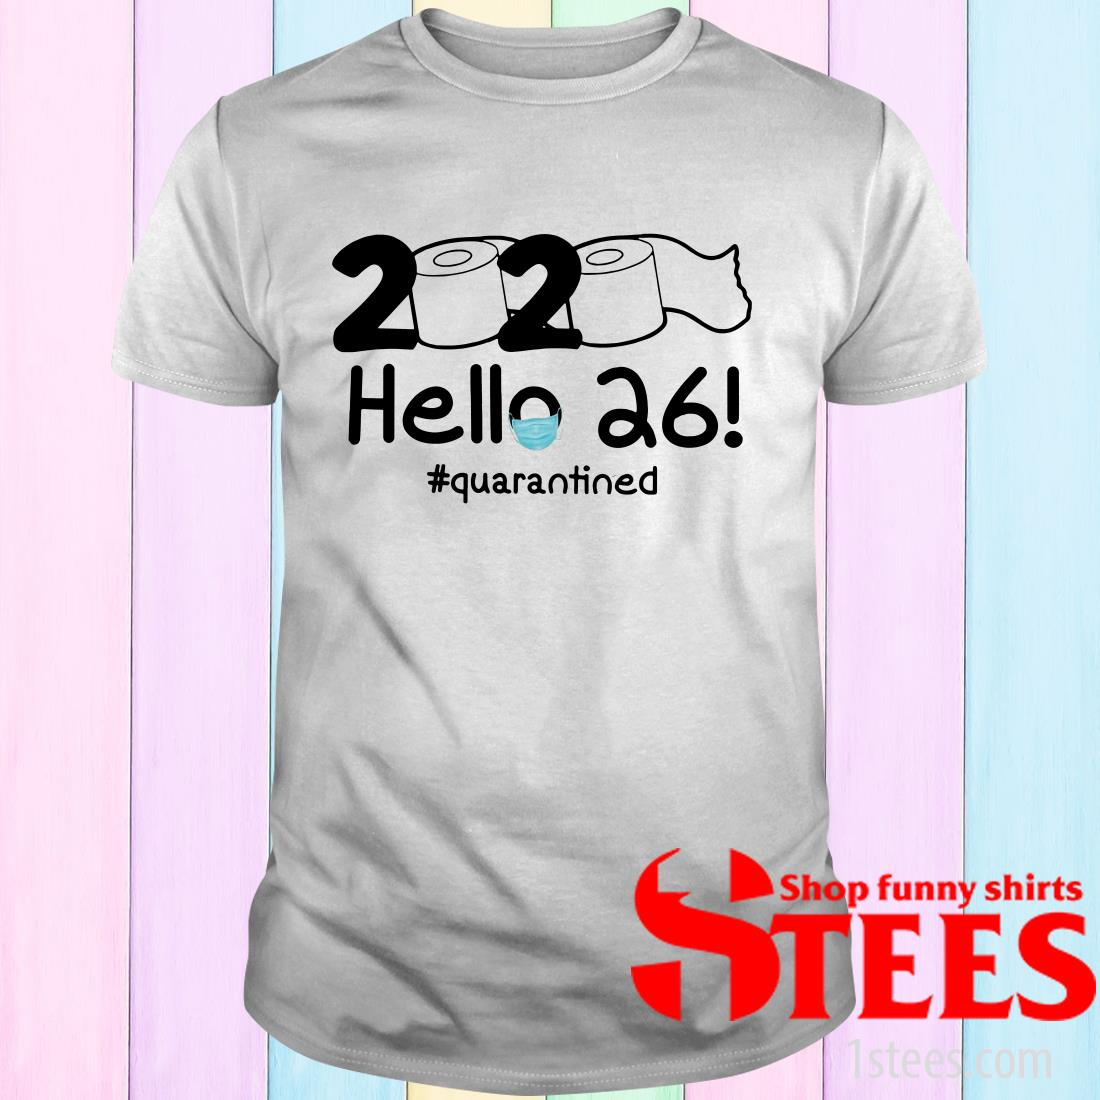 2020 Hello 26 #Quarantined Shirt